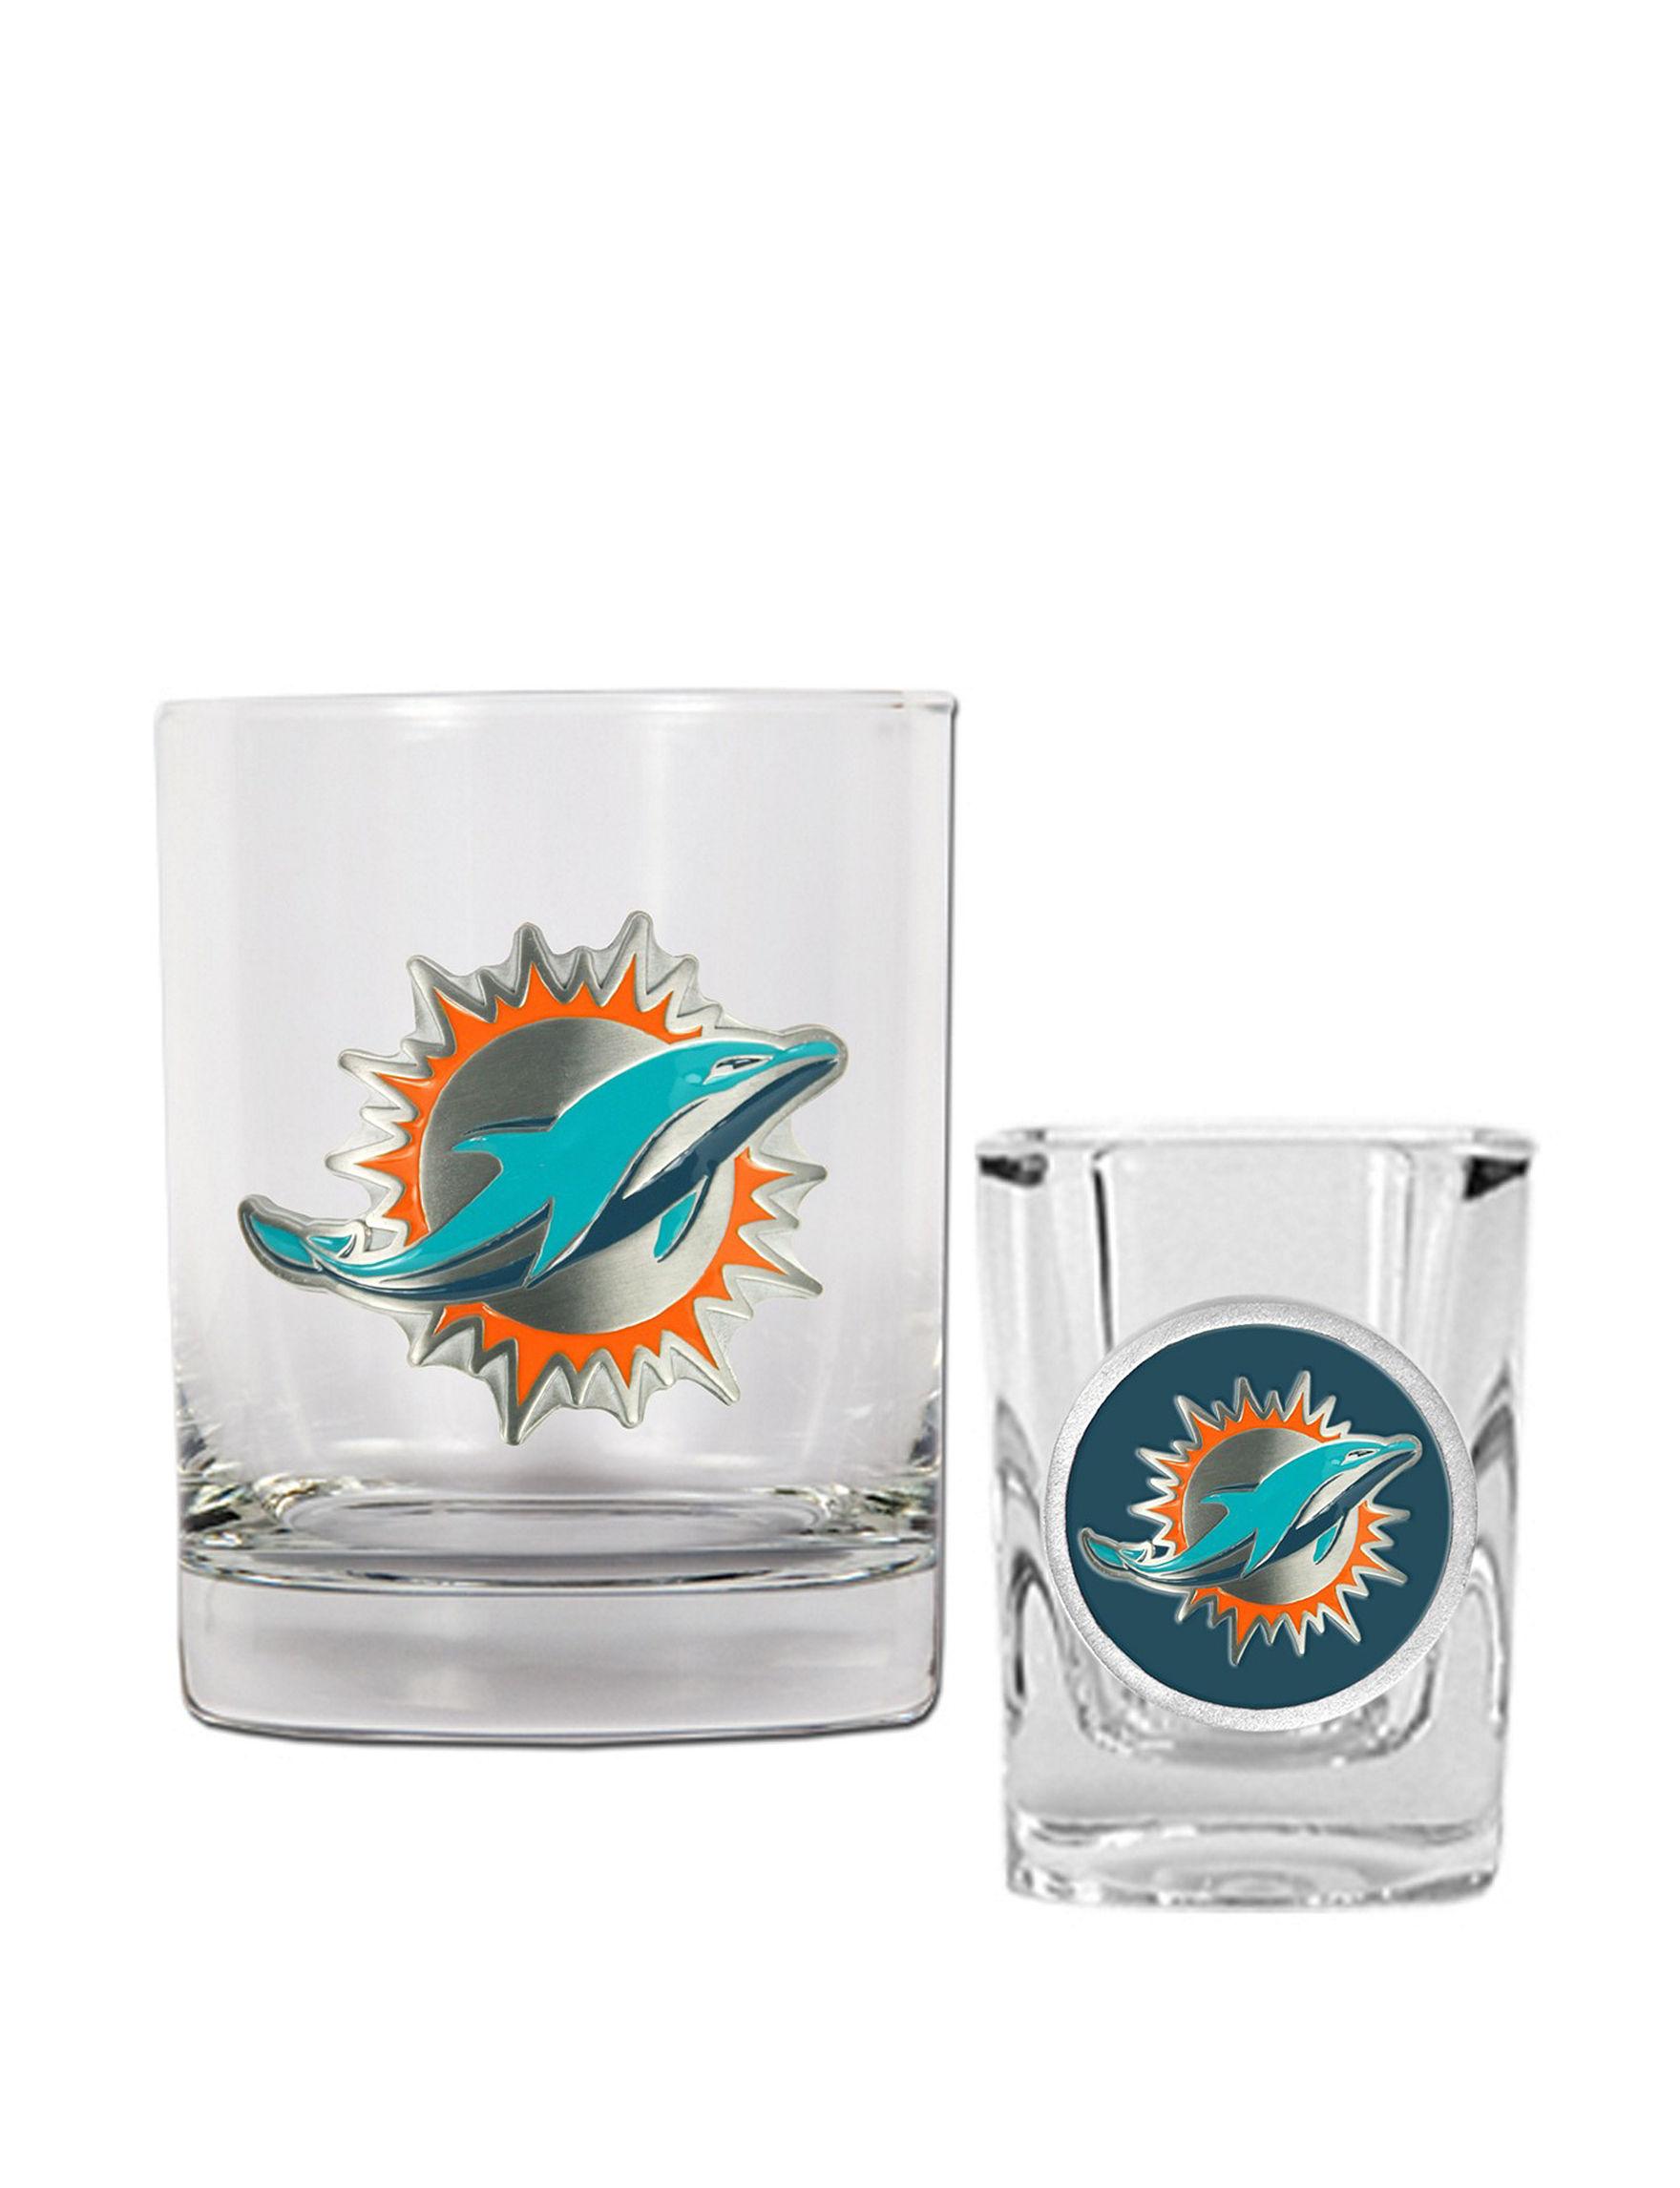 NFL Clear Cocktail & Liquor Glasses Drinkware Sets Drinkware NFL